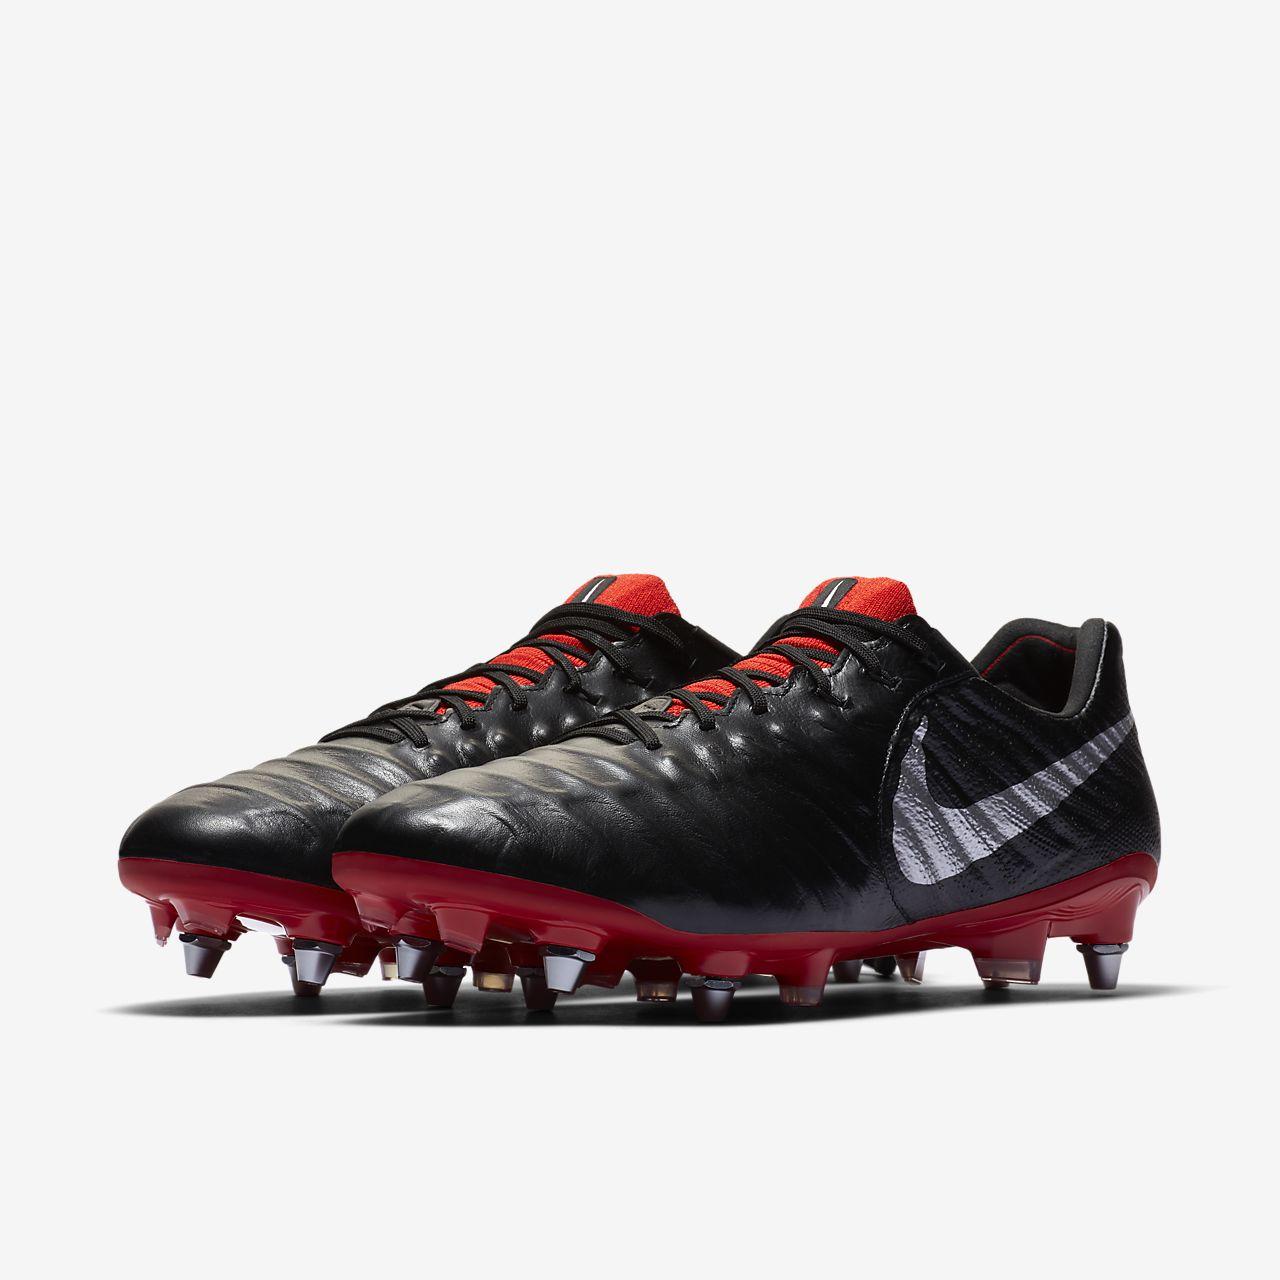 newest 0cdfa c61c2 ... Nike Tiempo Legend 7 Elite SG-Pro Soft-Ground Pro Football Boot